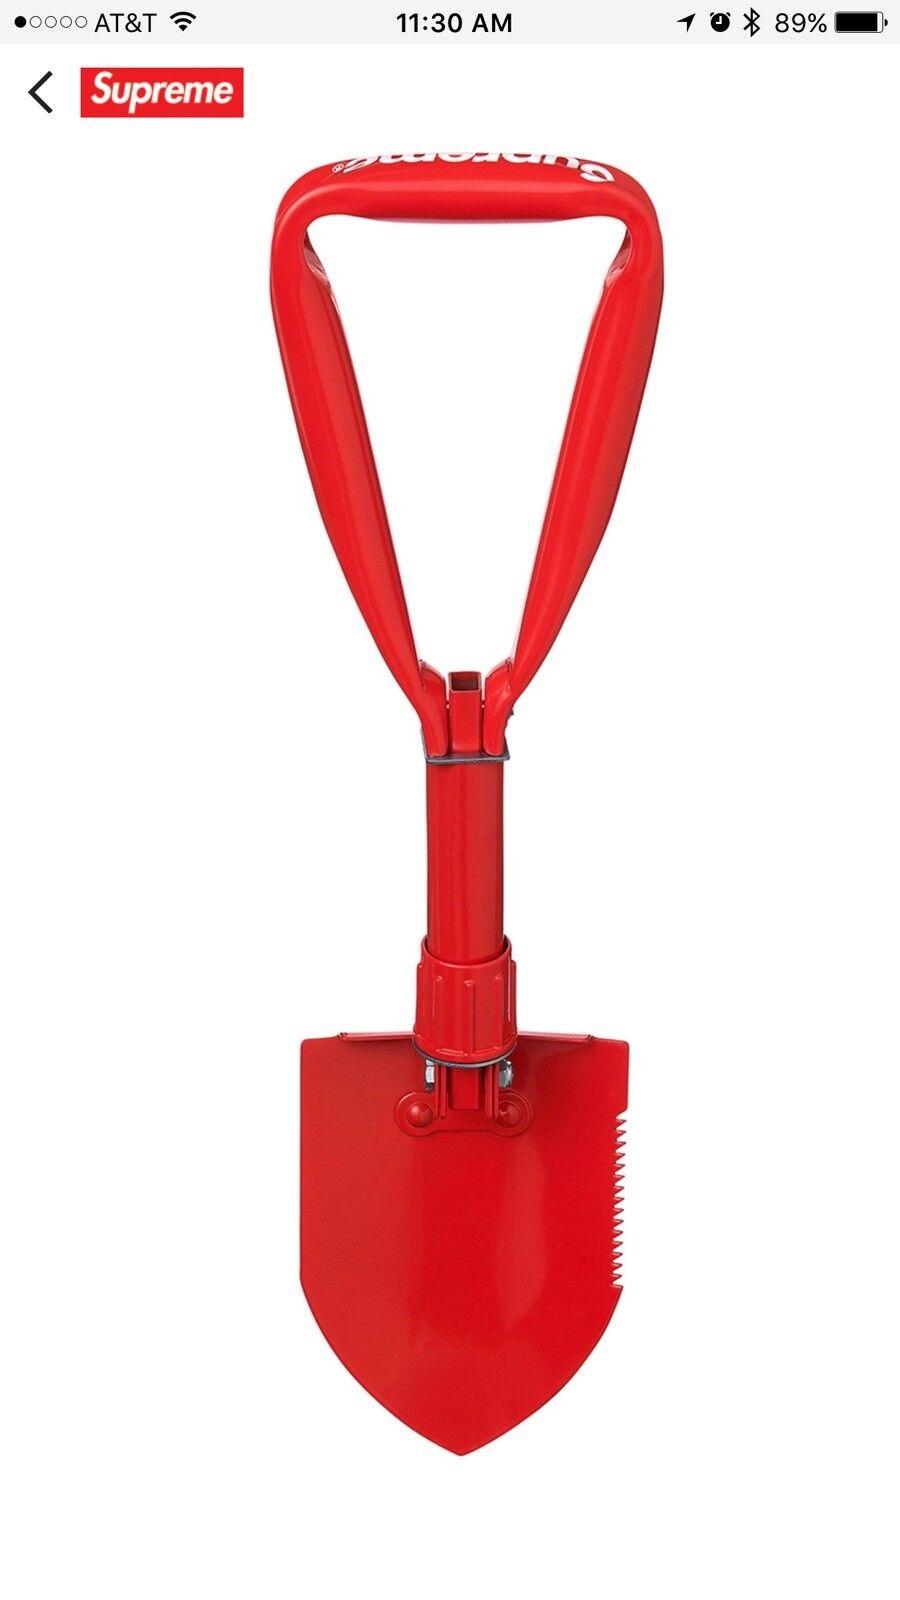 Supreme SOG Collapsible Shovel Red Box Logo FW17 Fall Winter 2017 Nas Tee